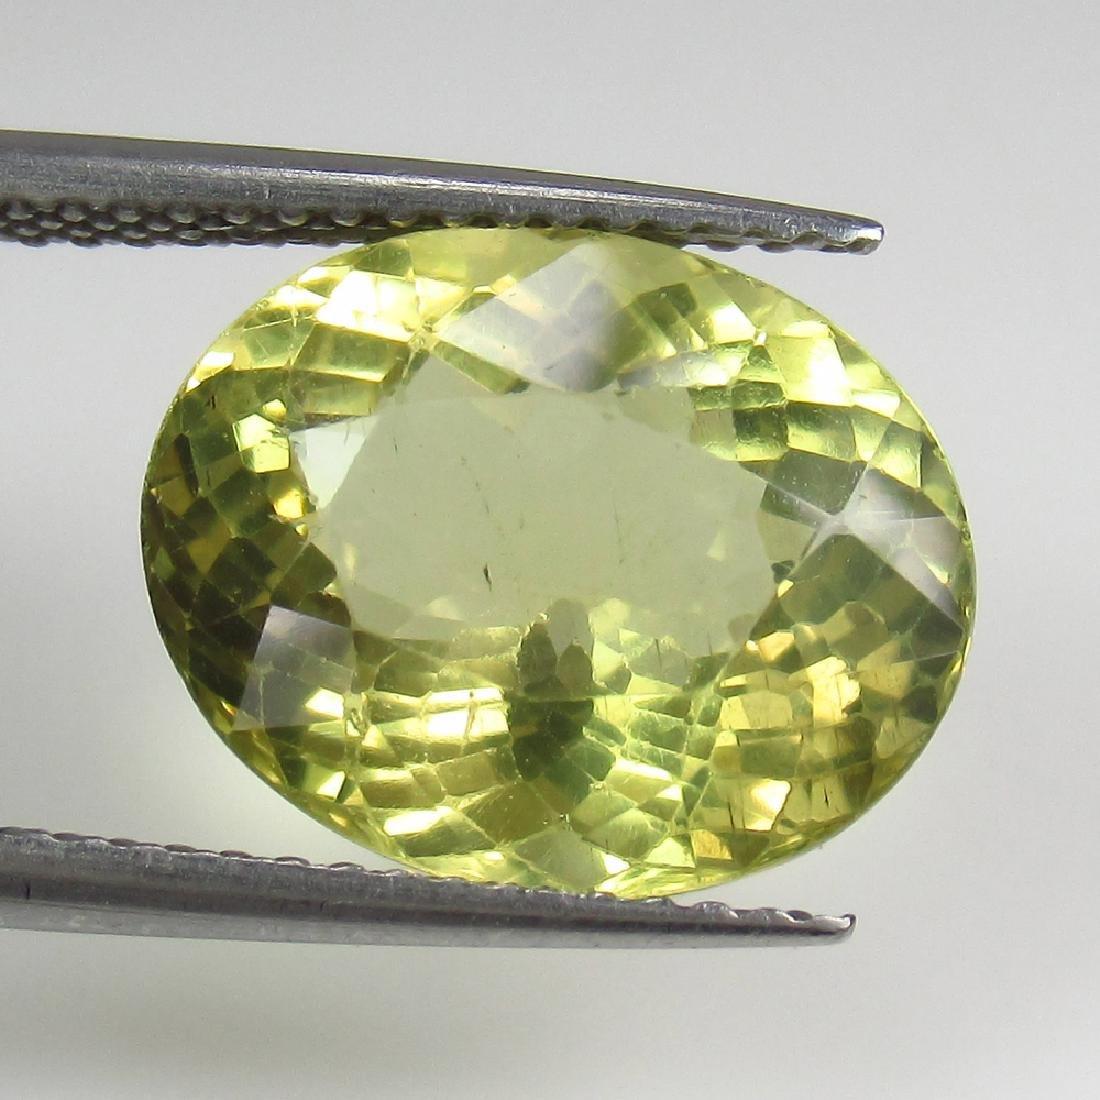 6.05 Ct Genuine Yellowish Green Apatite 13X10.5 mm Oval